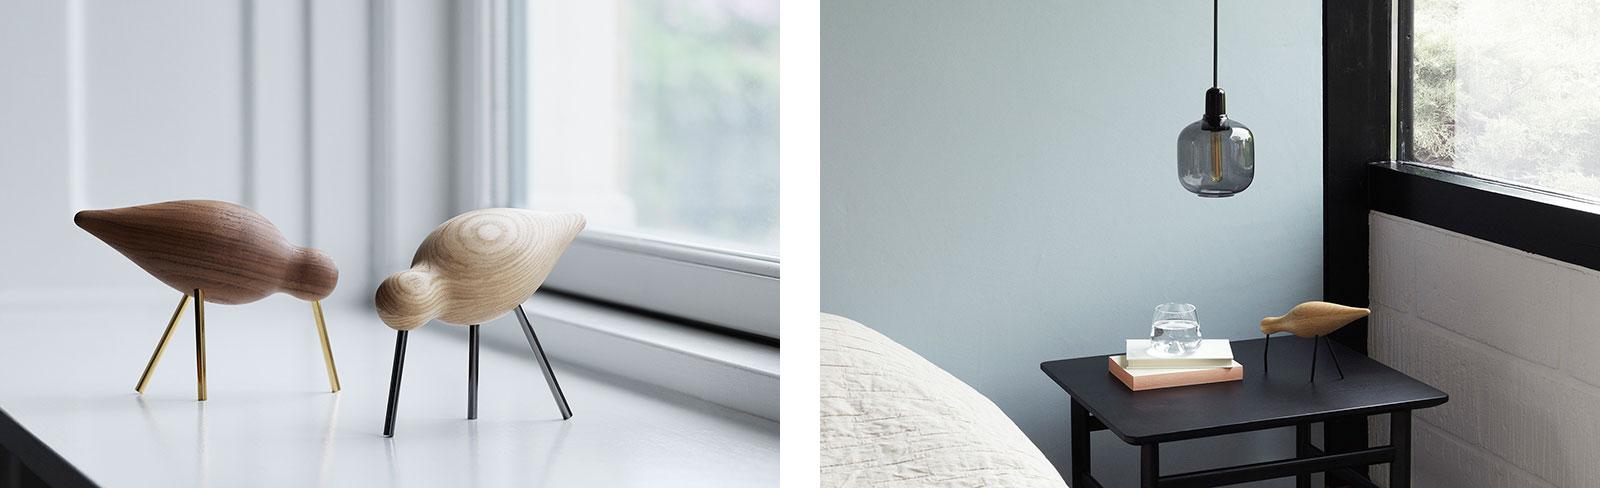 "Skandinavisches Design: ""Shorebirds"" und ""Amp Lamp"" (Links)"